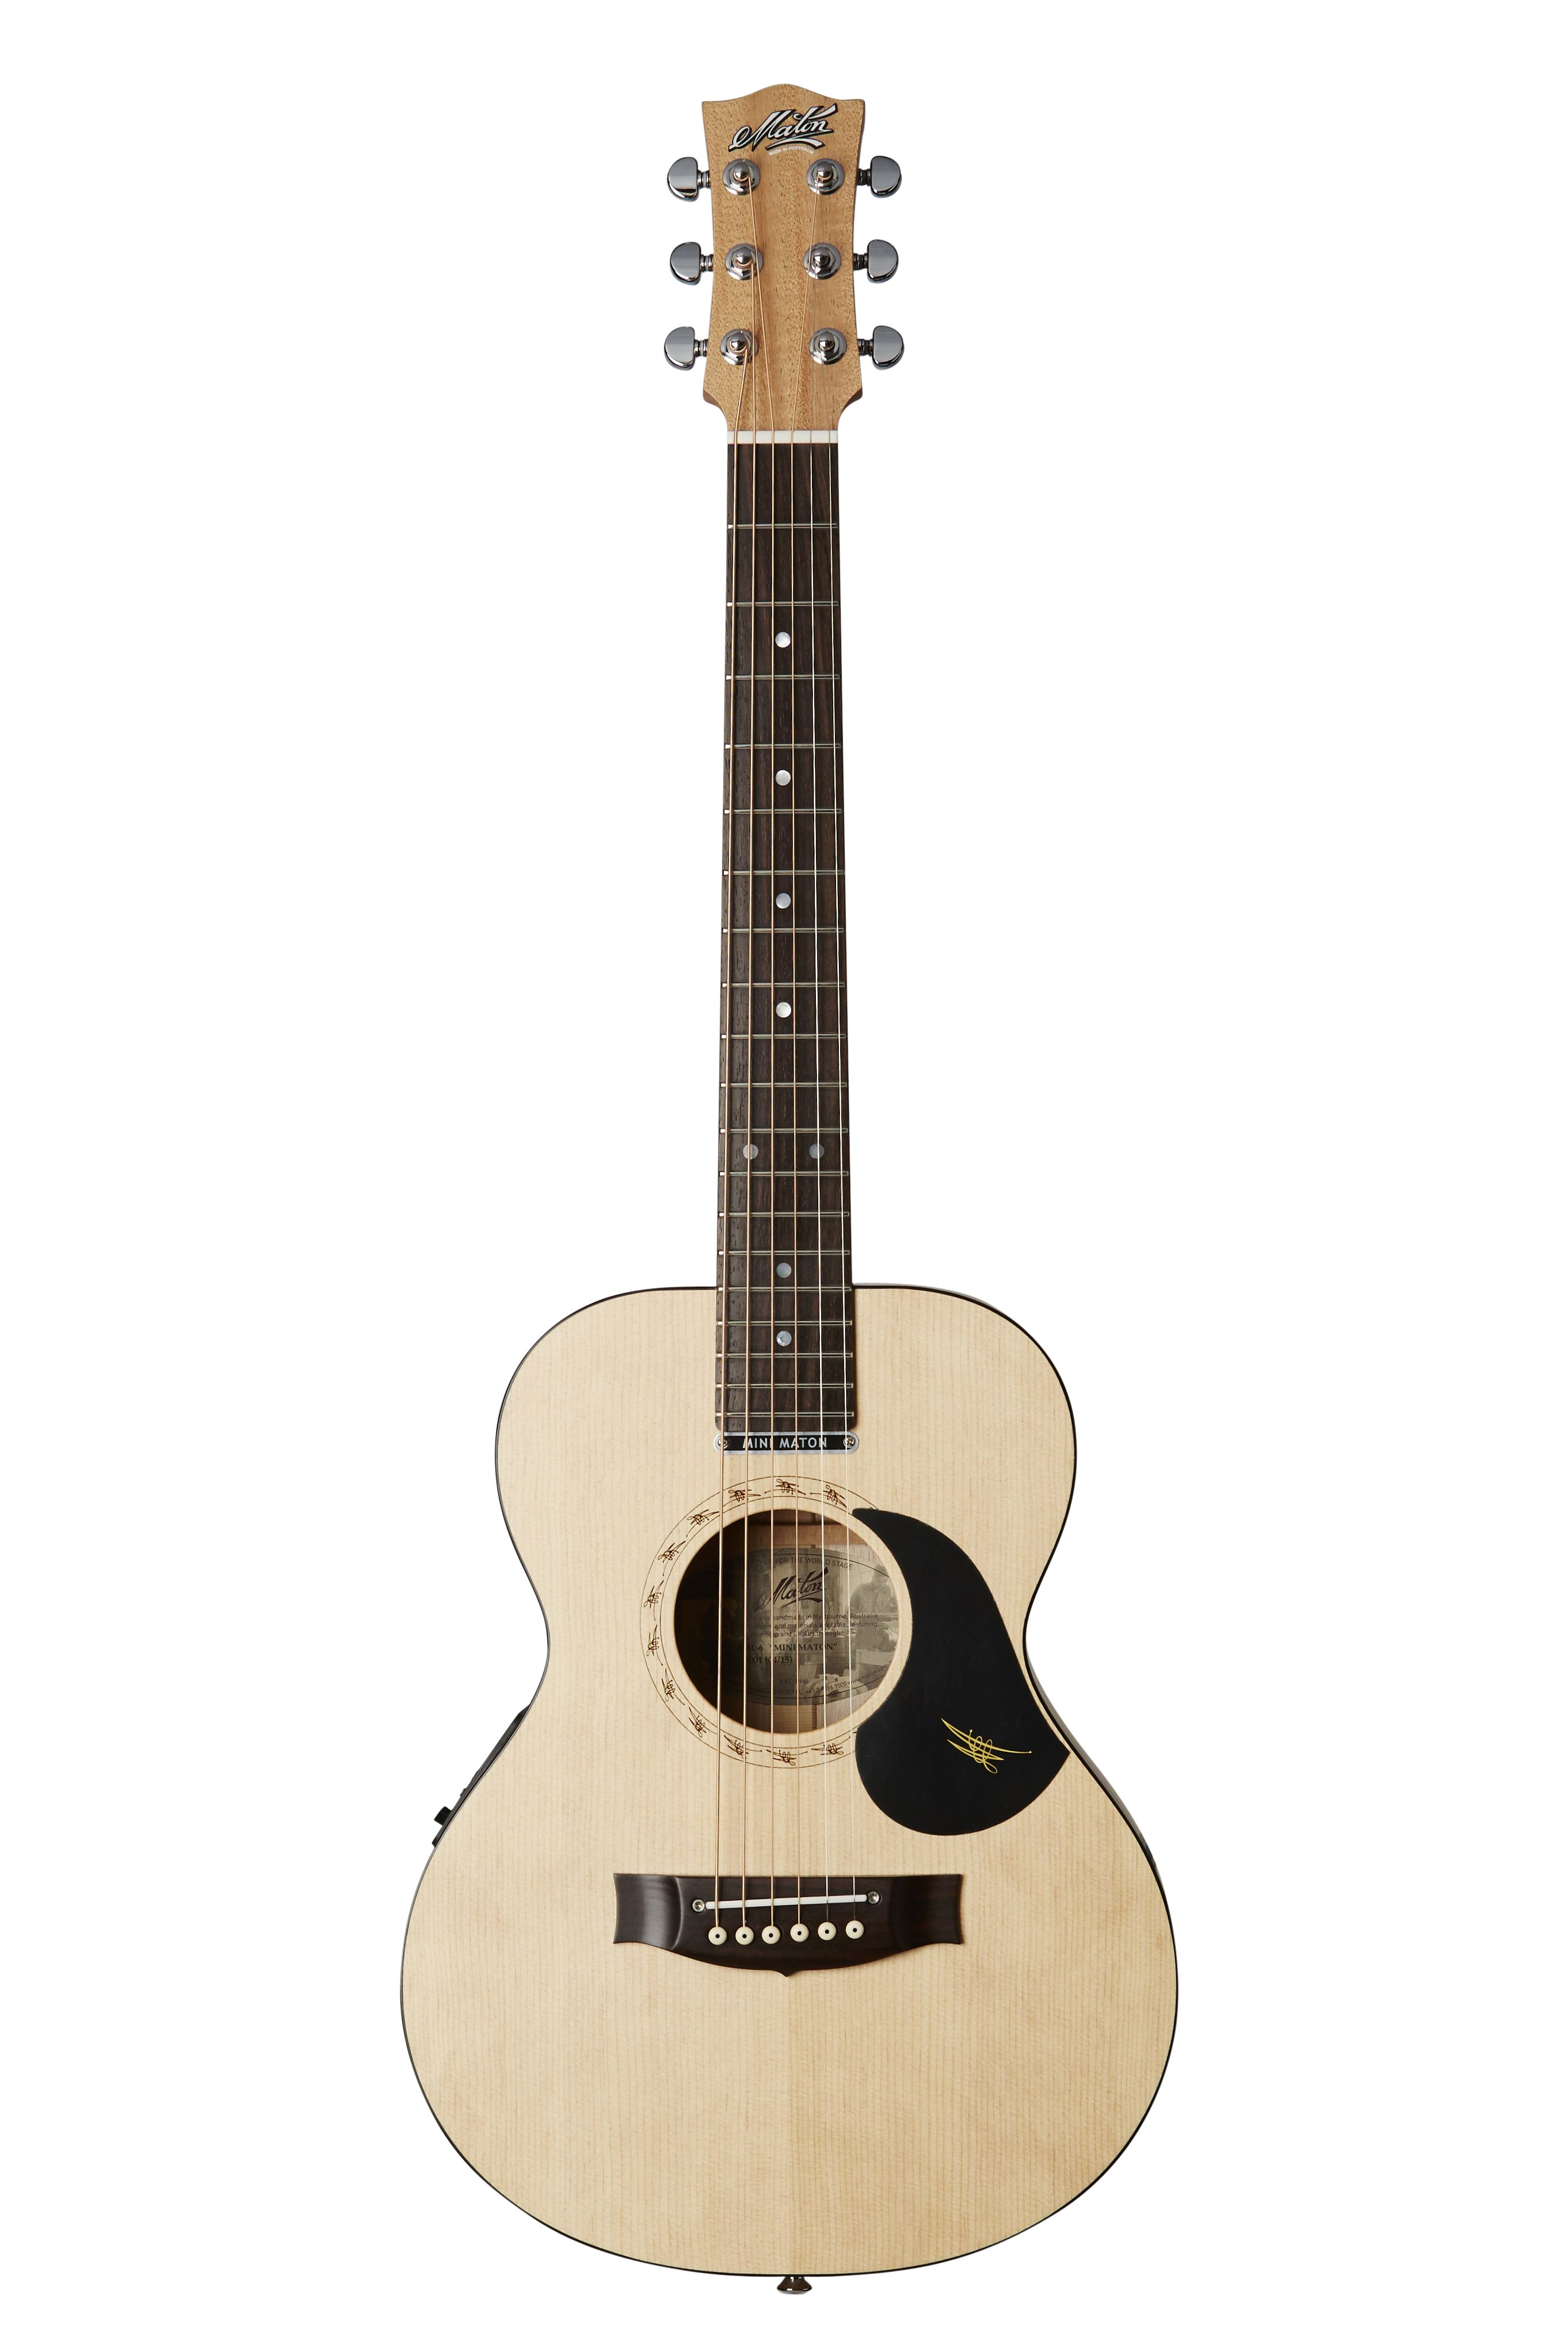 Australian, Handmade, Acoustic EM-6 from Maton Guitars. Front View ...